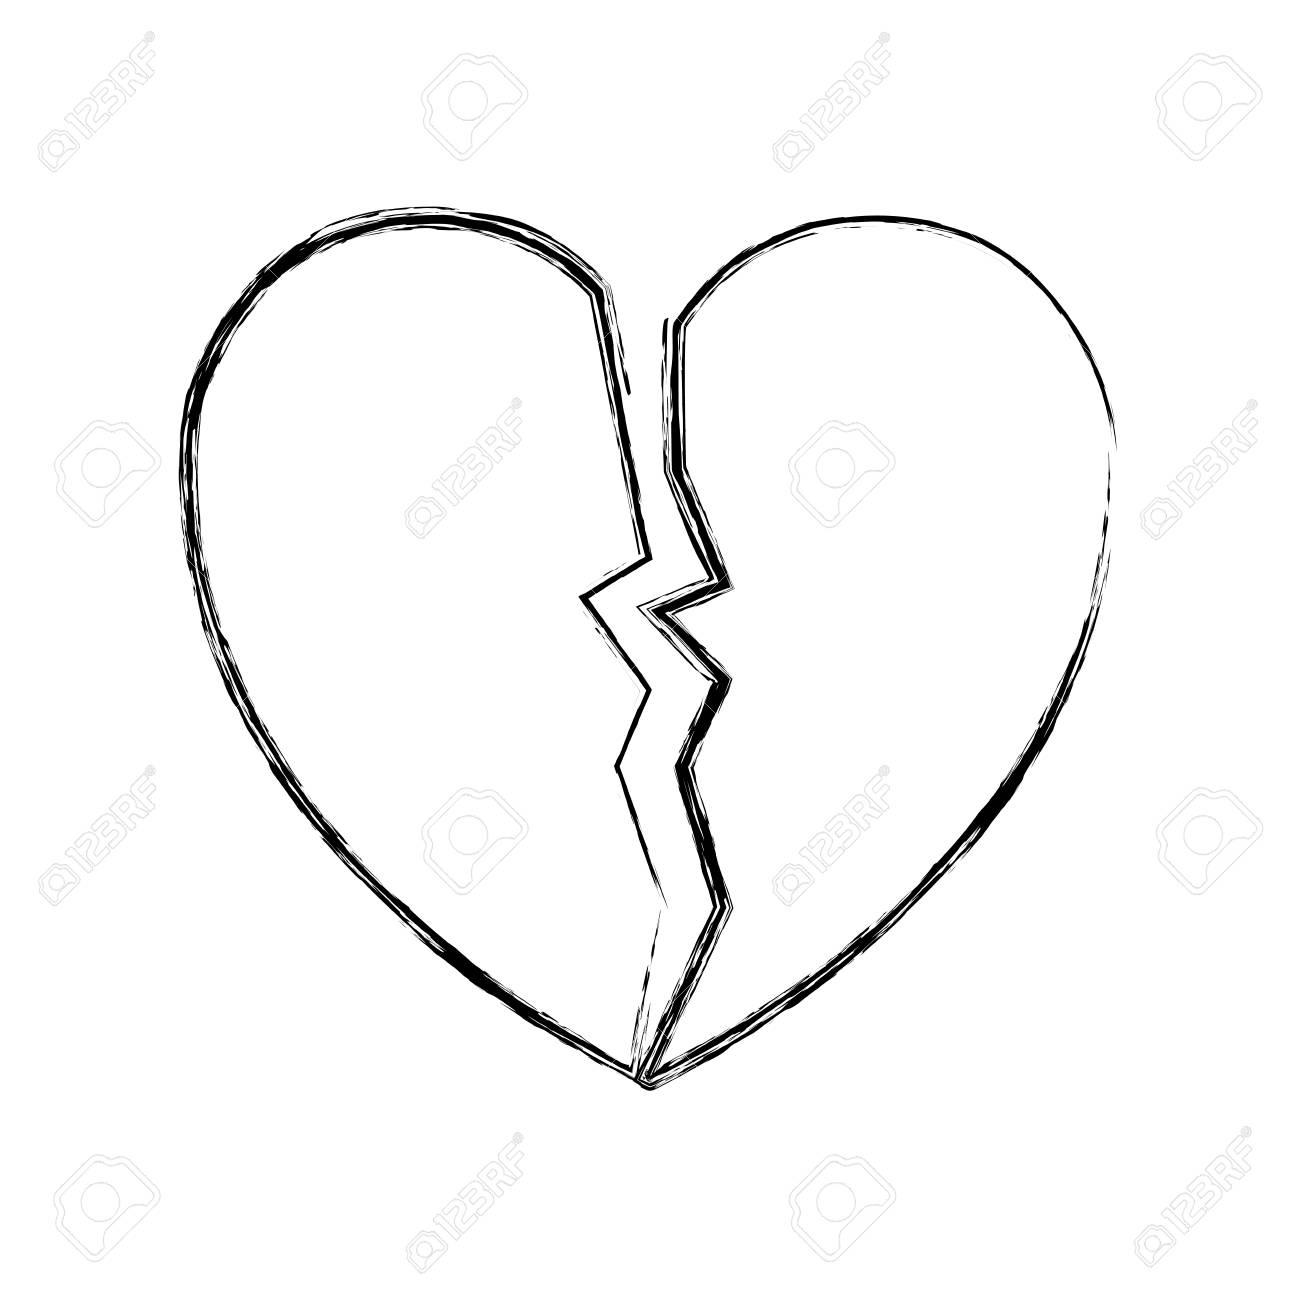 sketch of broken heart icon over white background vector illustration - 95855892